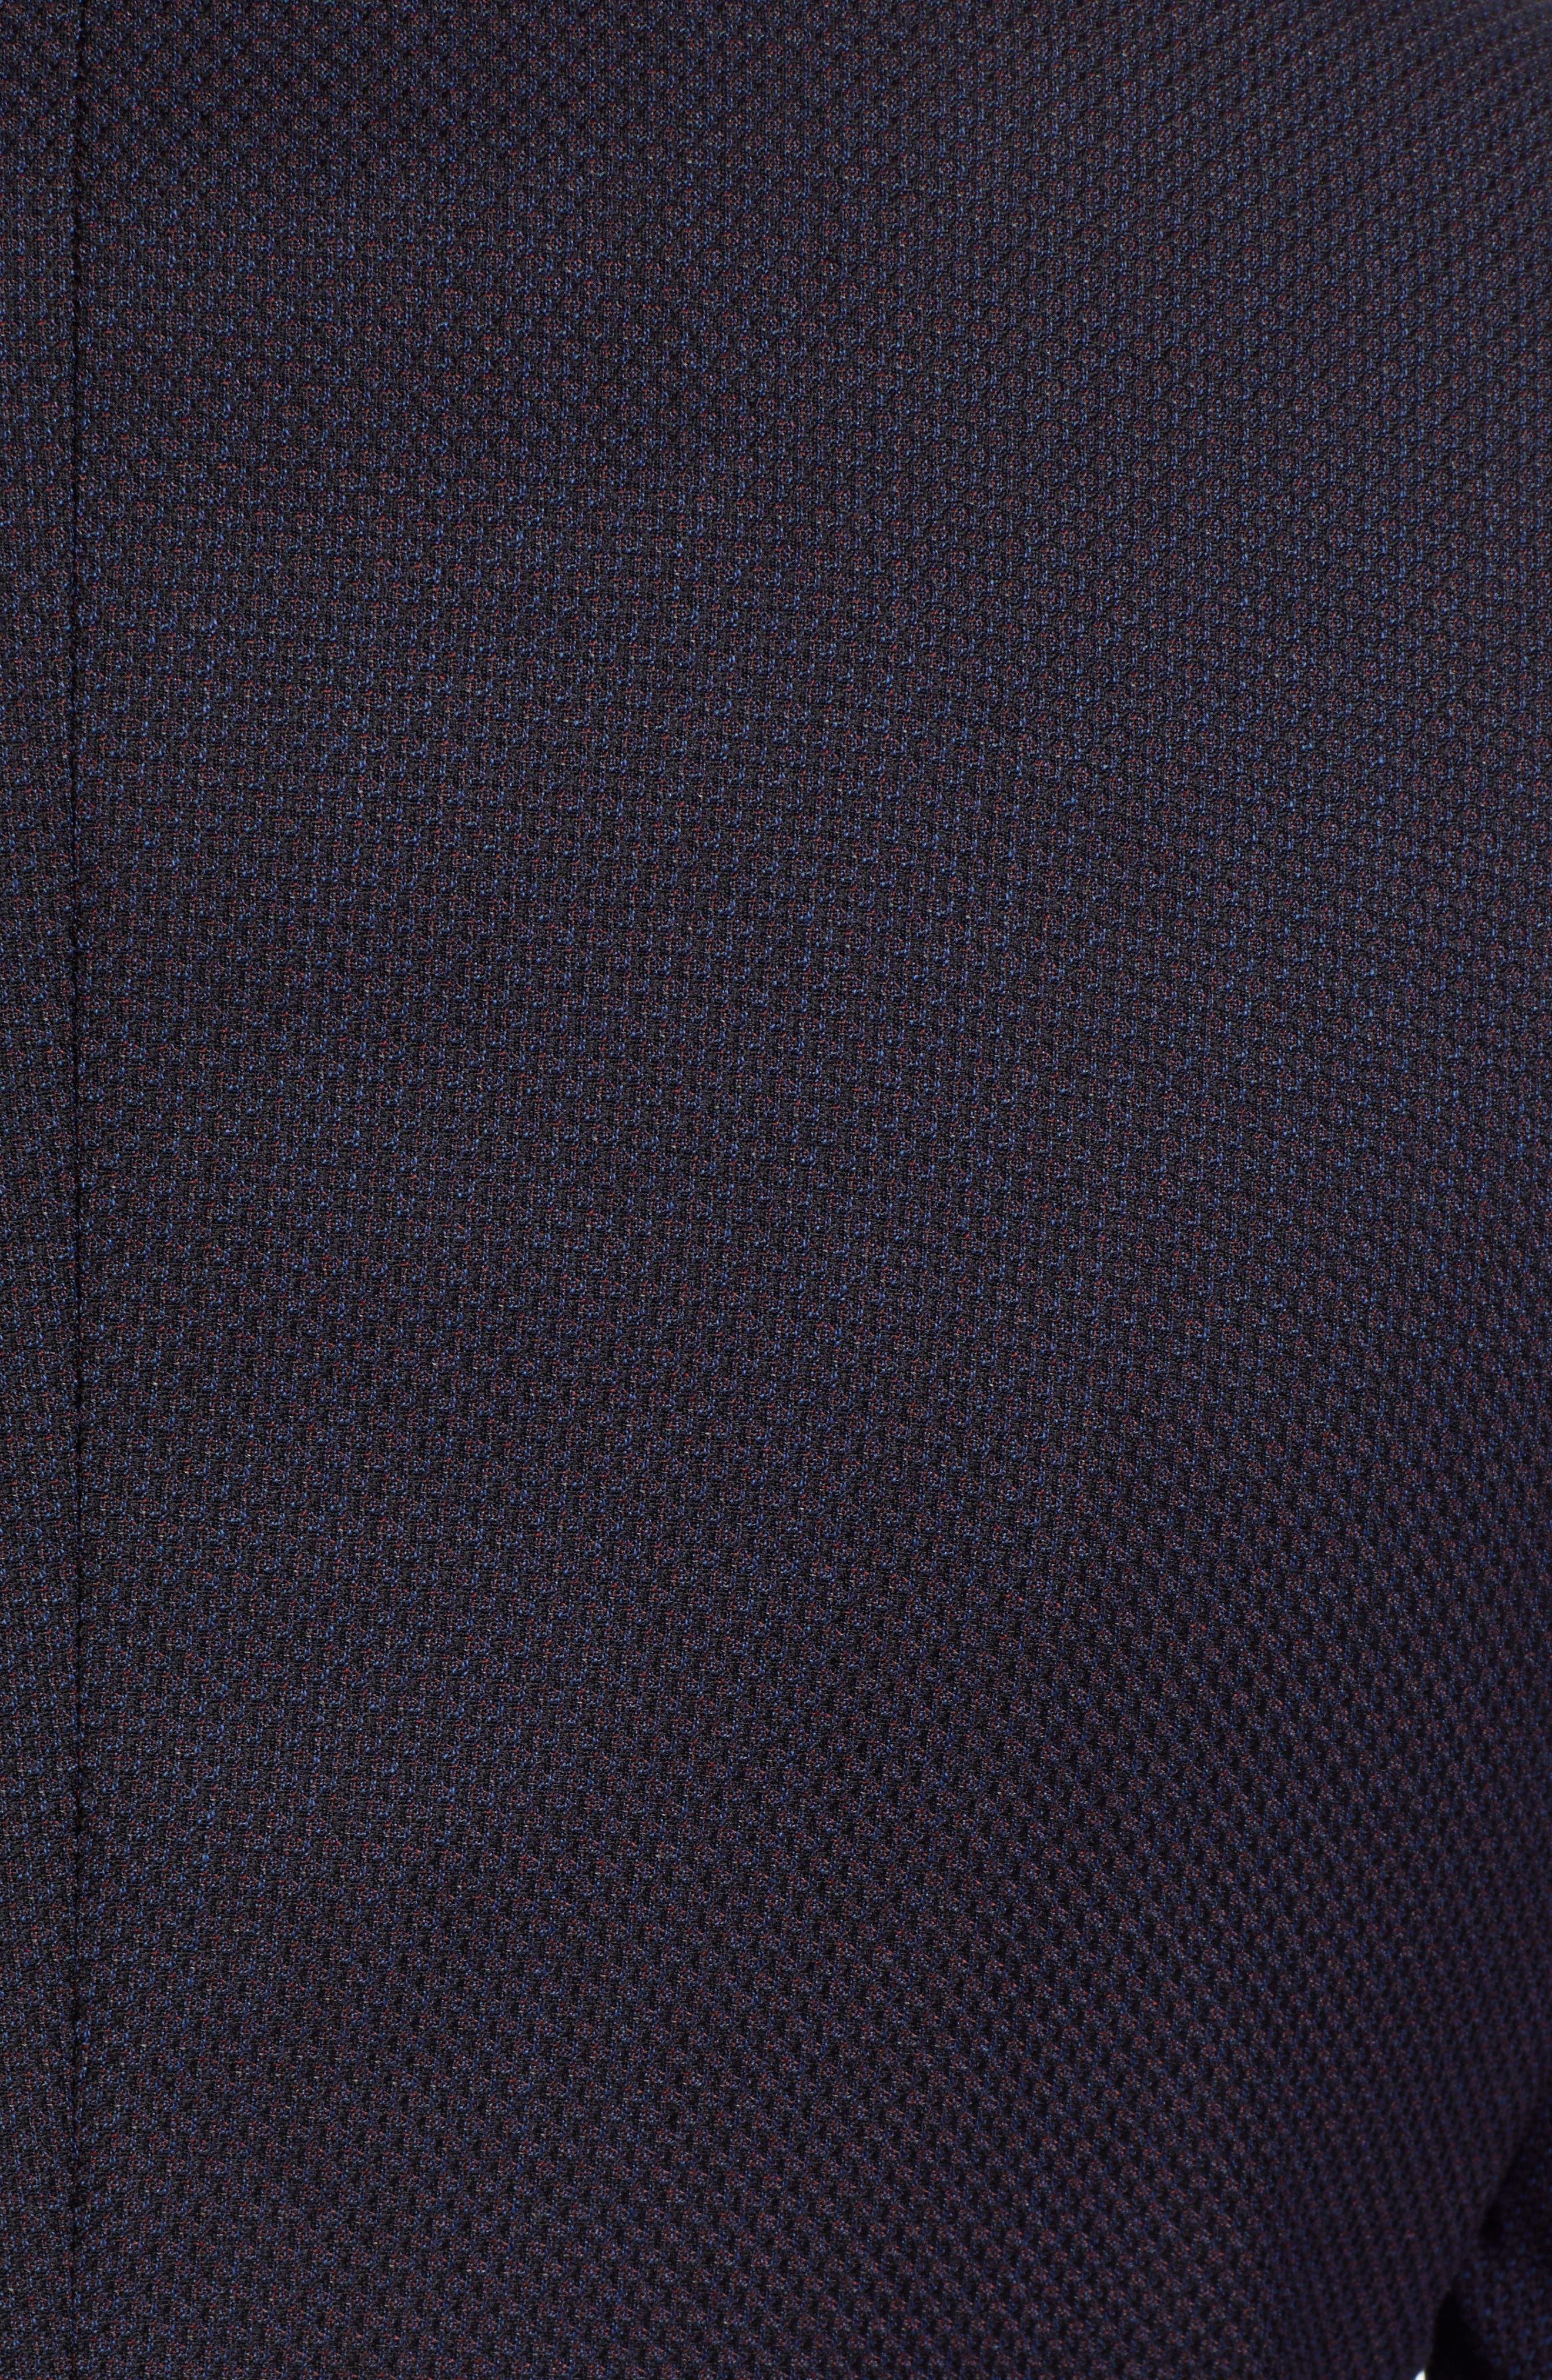 x Nordstrom Nobis Trim Fit Wool Blazer,                             Alternate thumbnail 6, color,                             NAVY